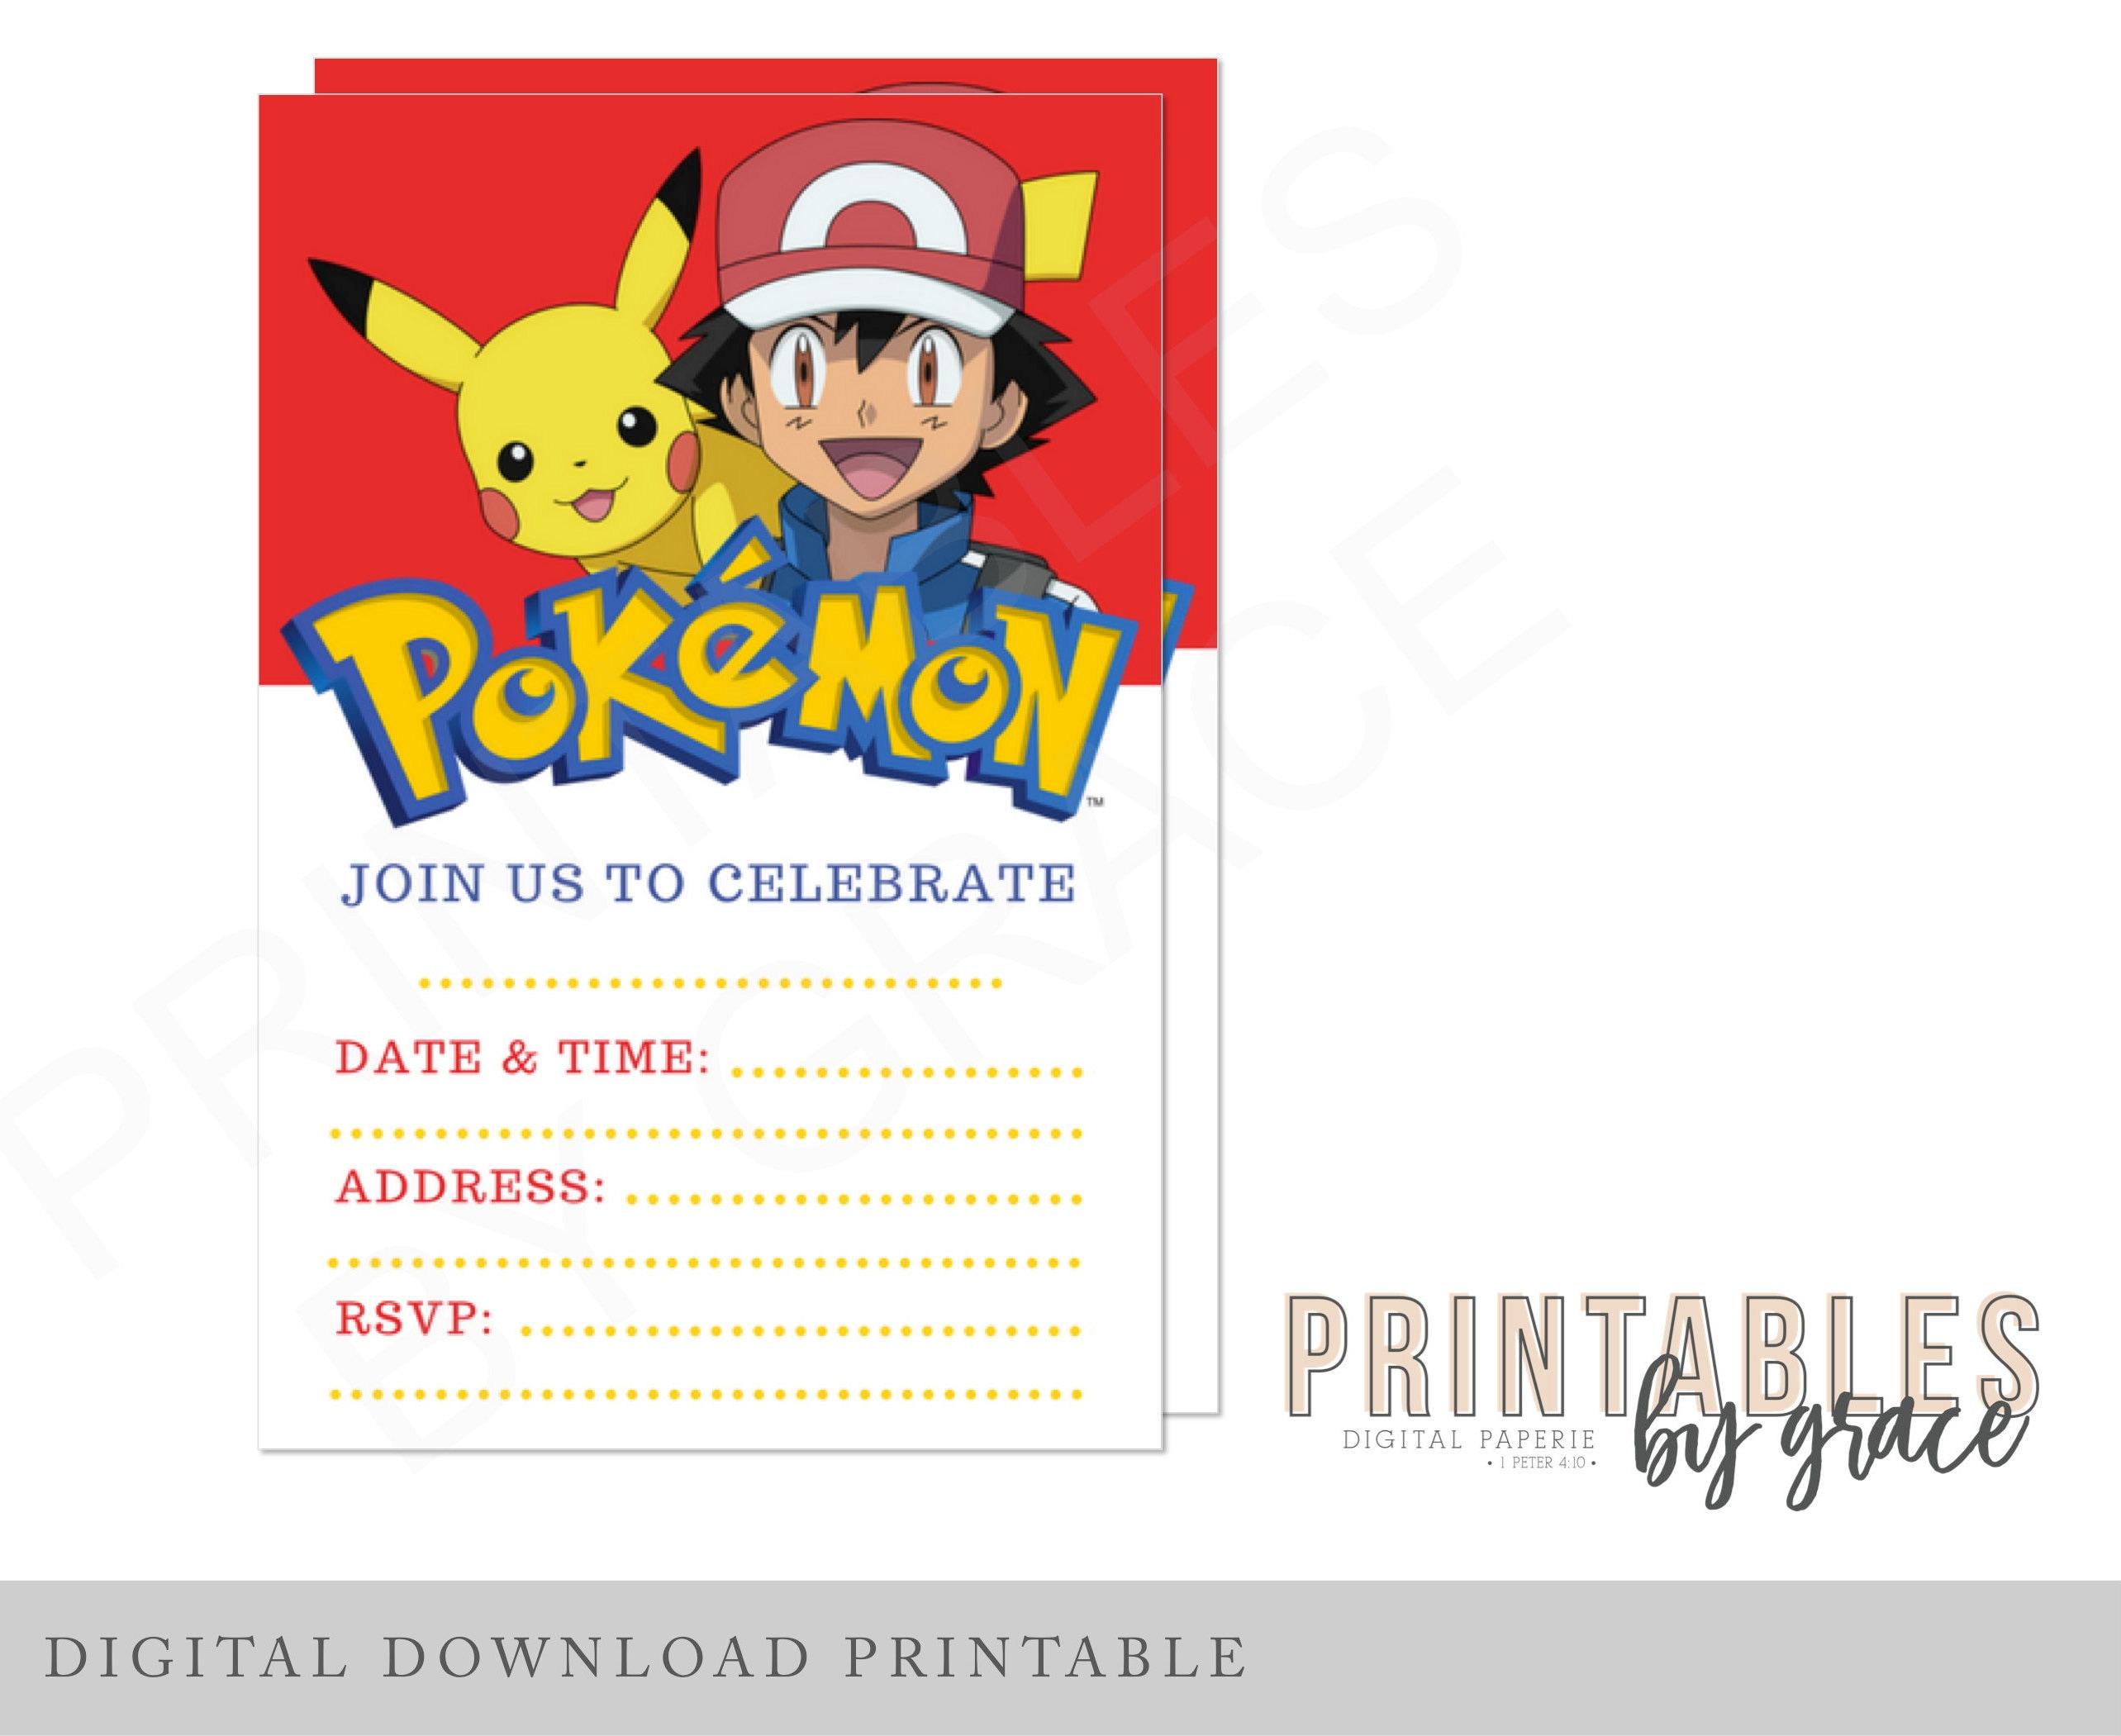 PRINTABLE INVITATION Pokemon Ash Pokeball Pikachu already